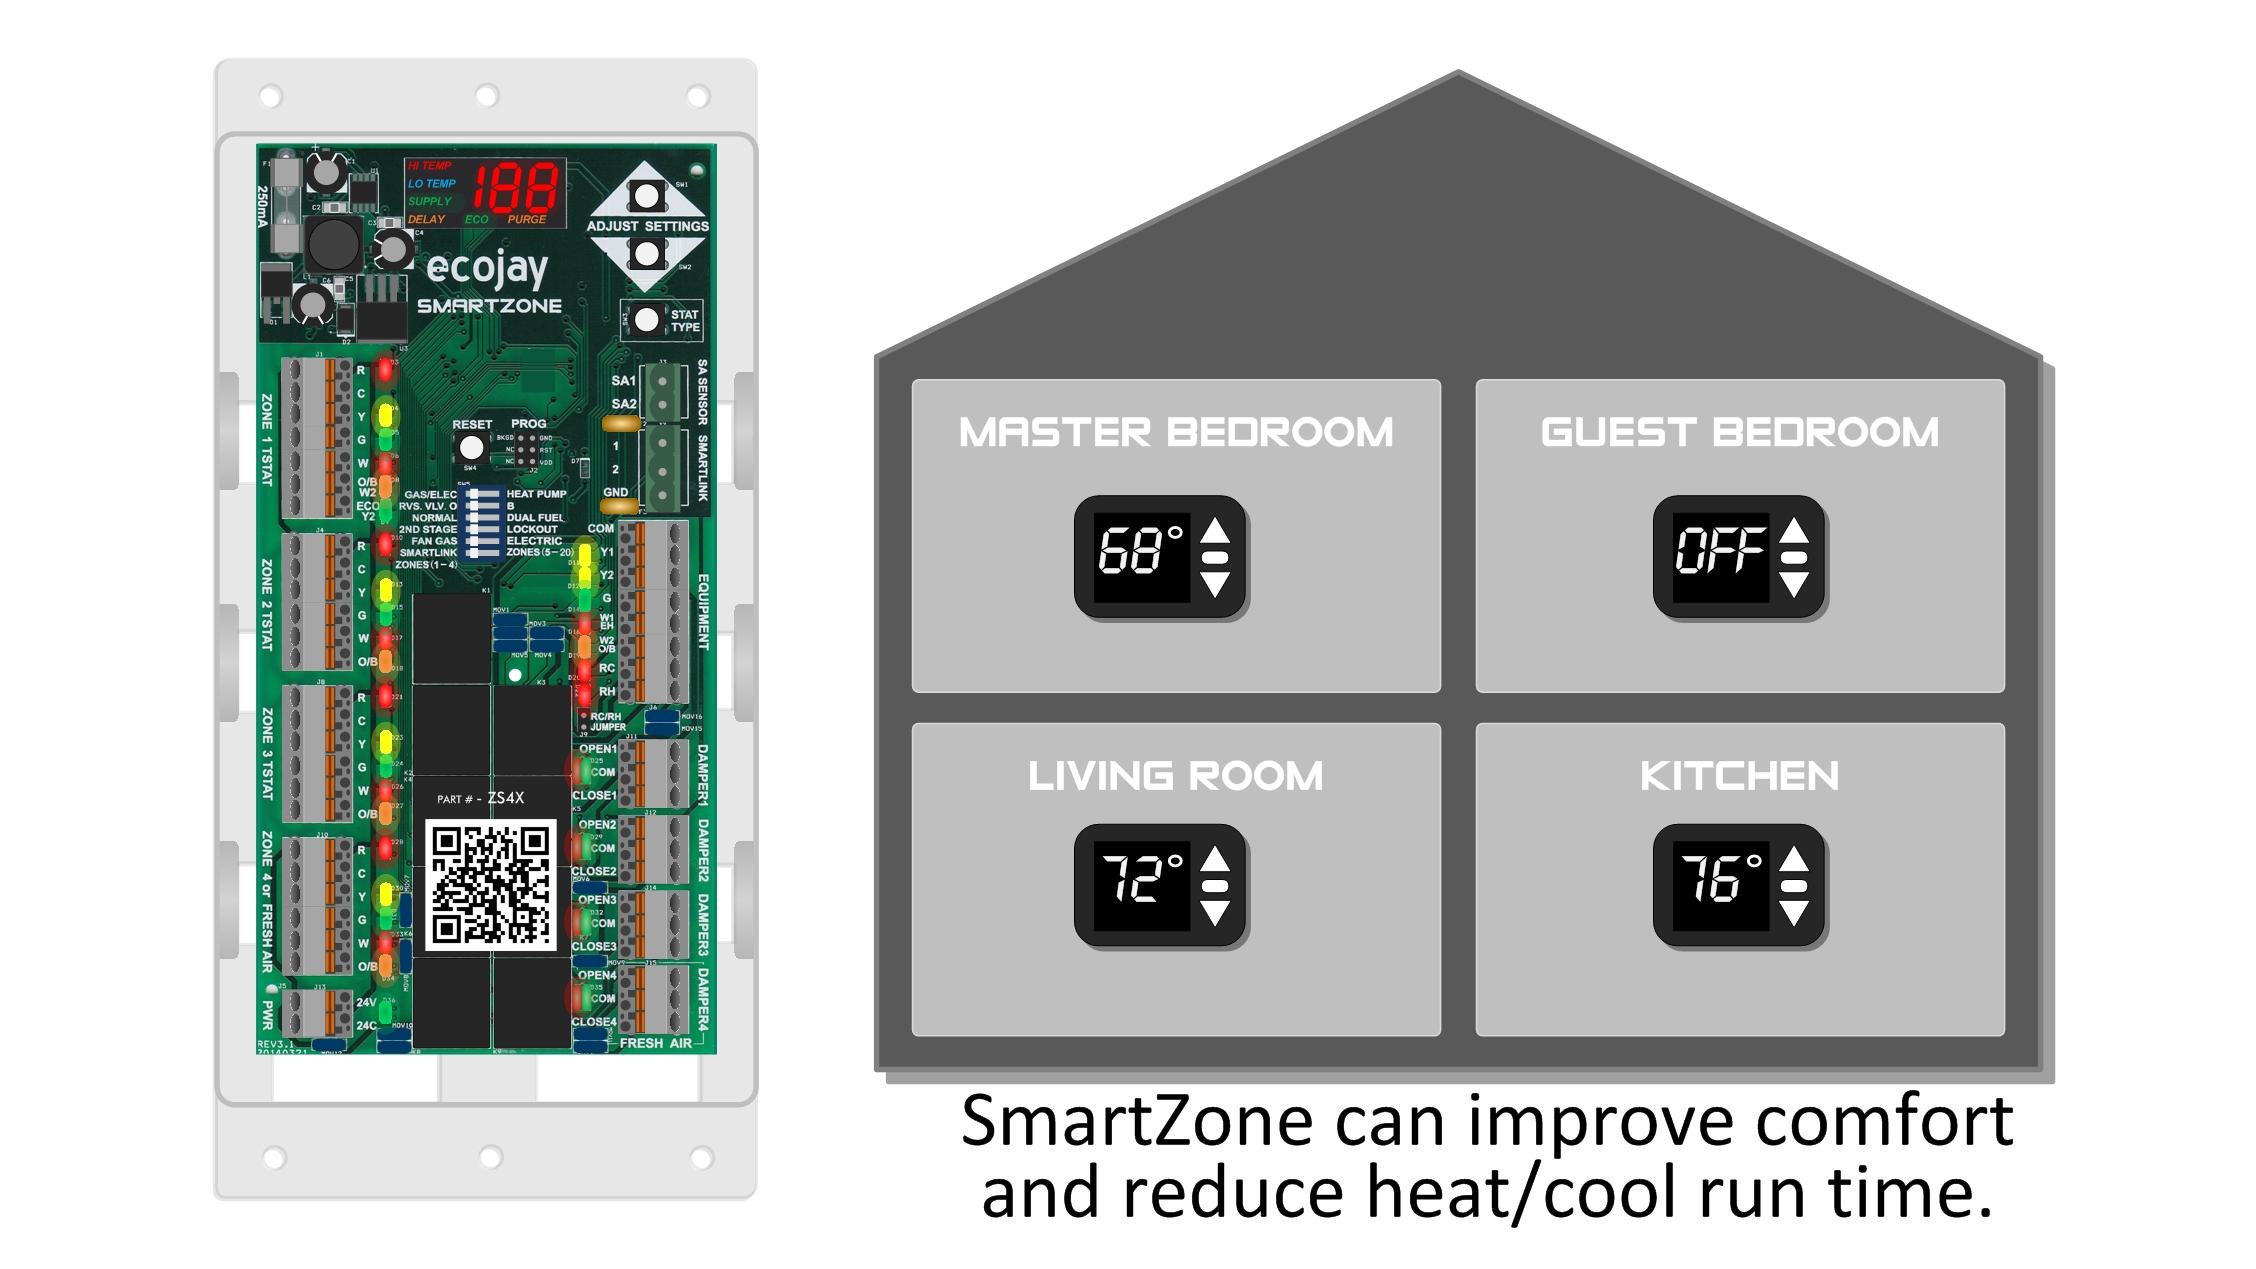 08 smartzone zoning supply banner.jpg